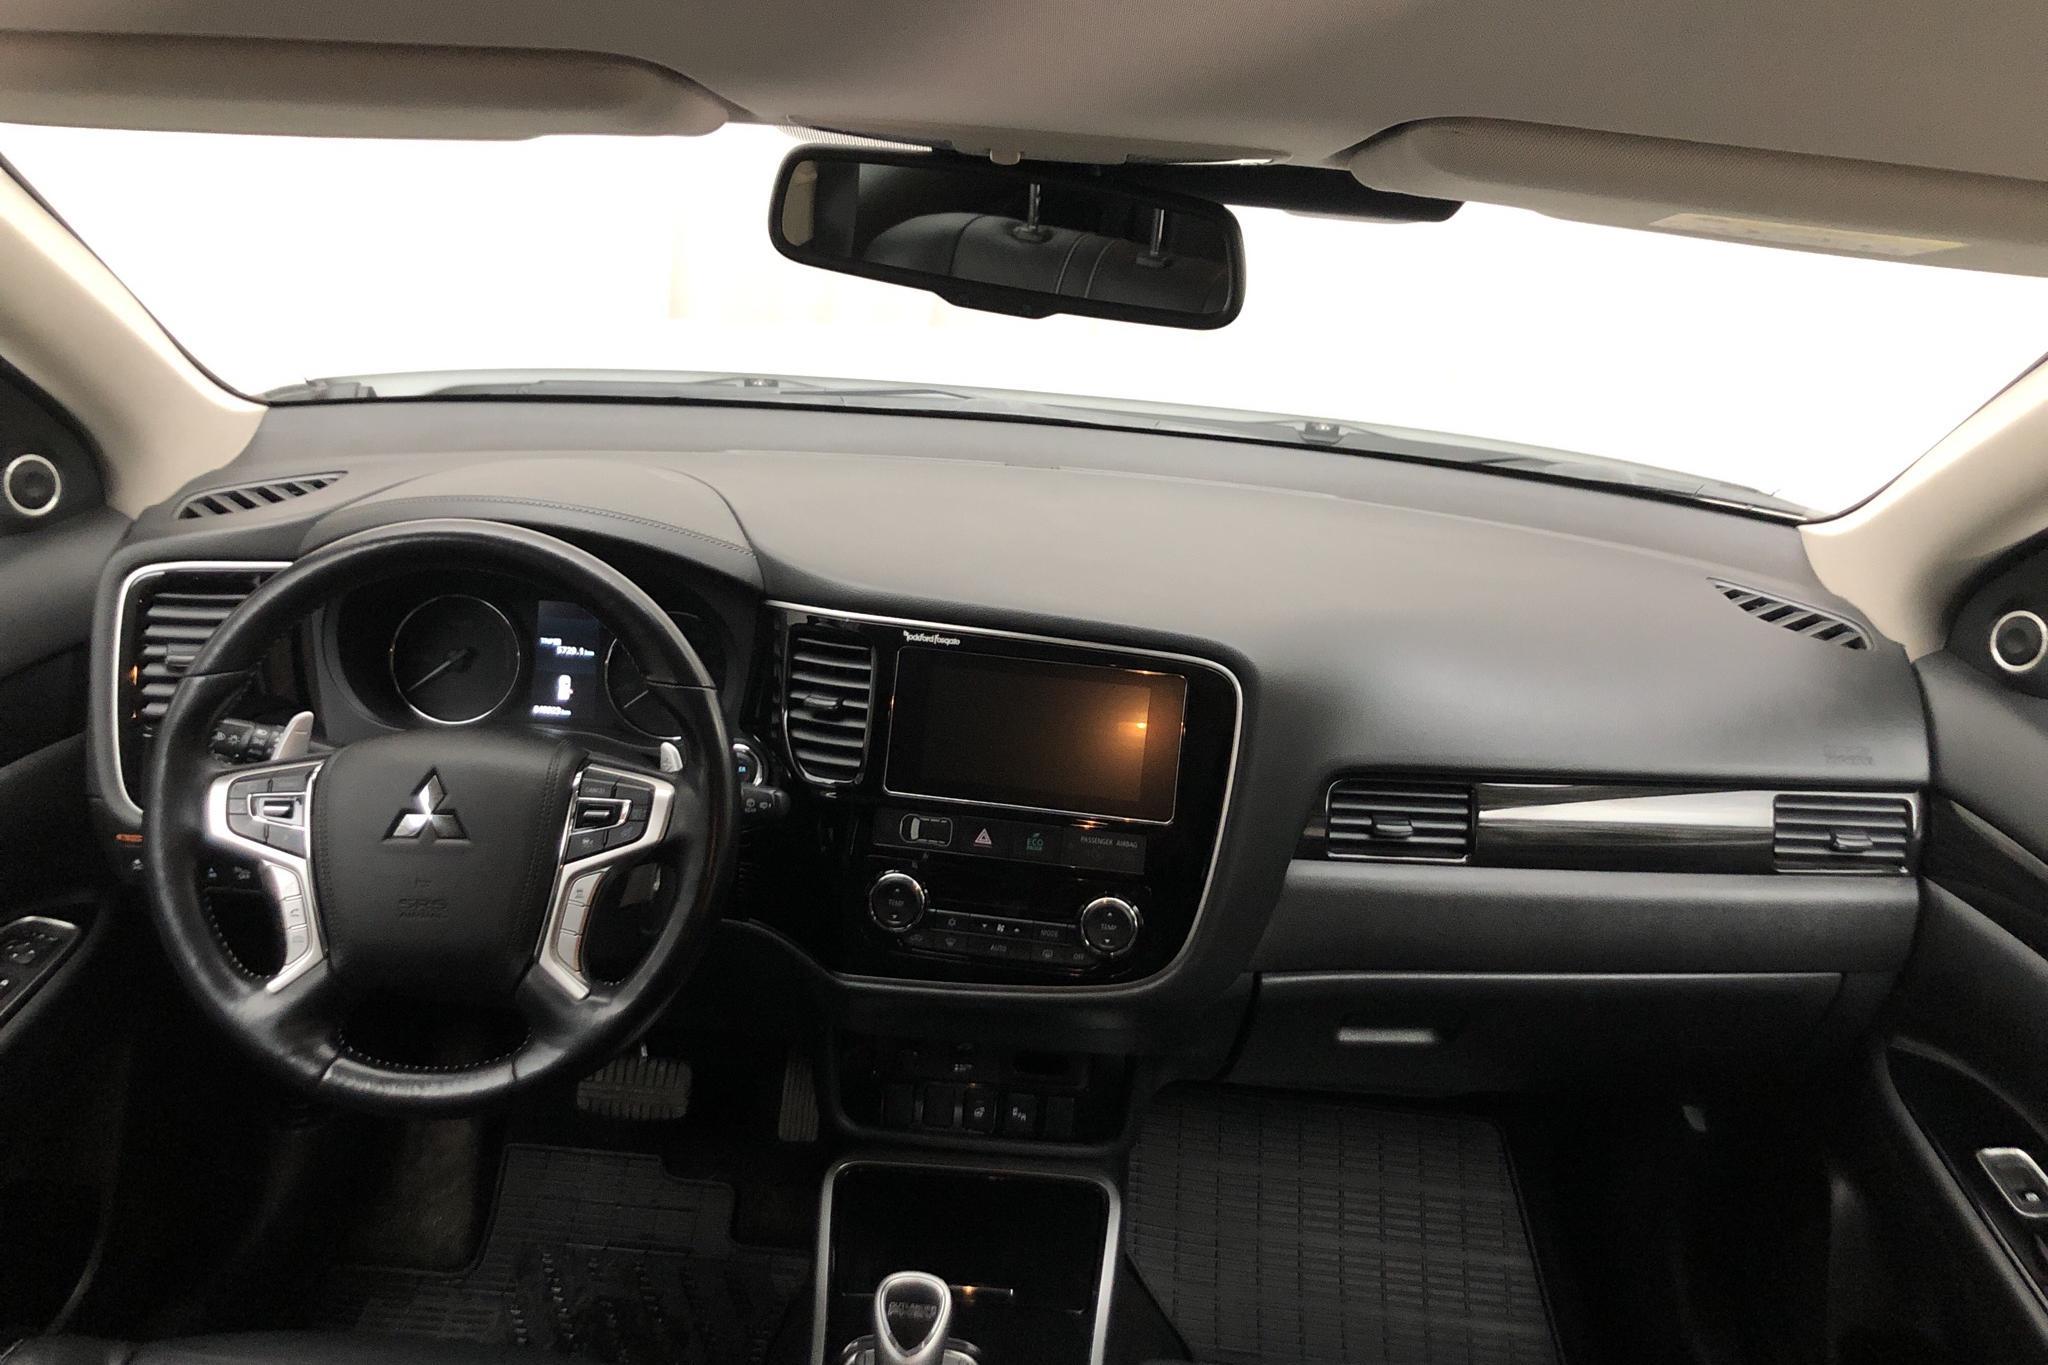 Mitsubishi Outlander 2.0 Plug-in Hybrid 4WD (121hk) - 4 892 mil - Automat - vit - 2018